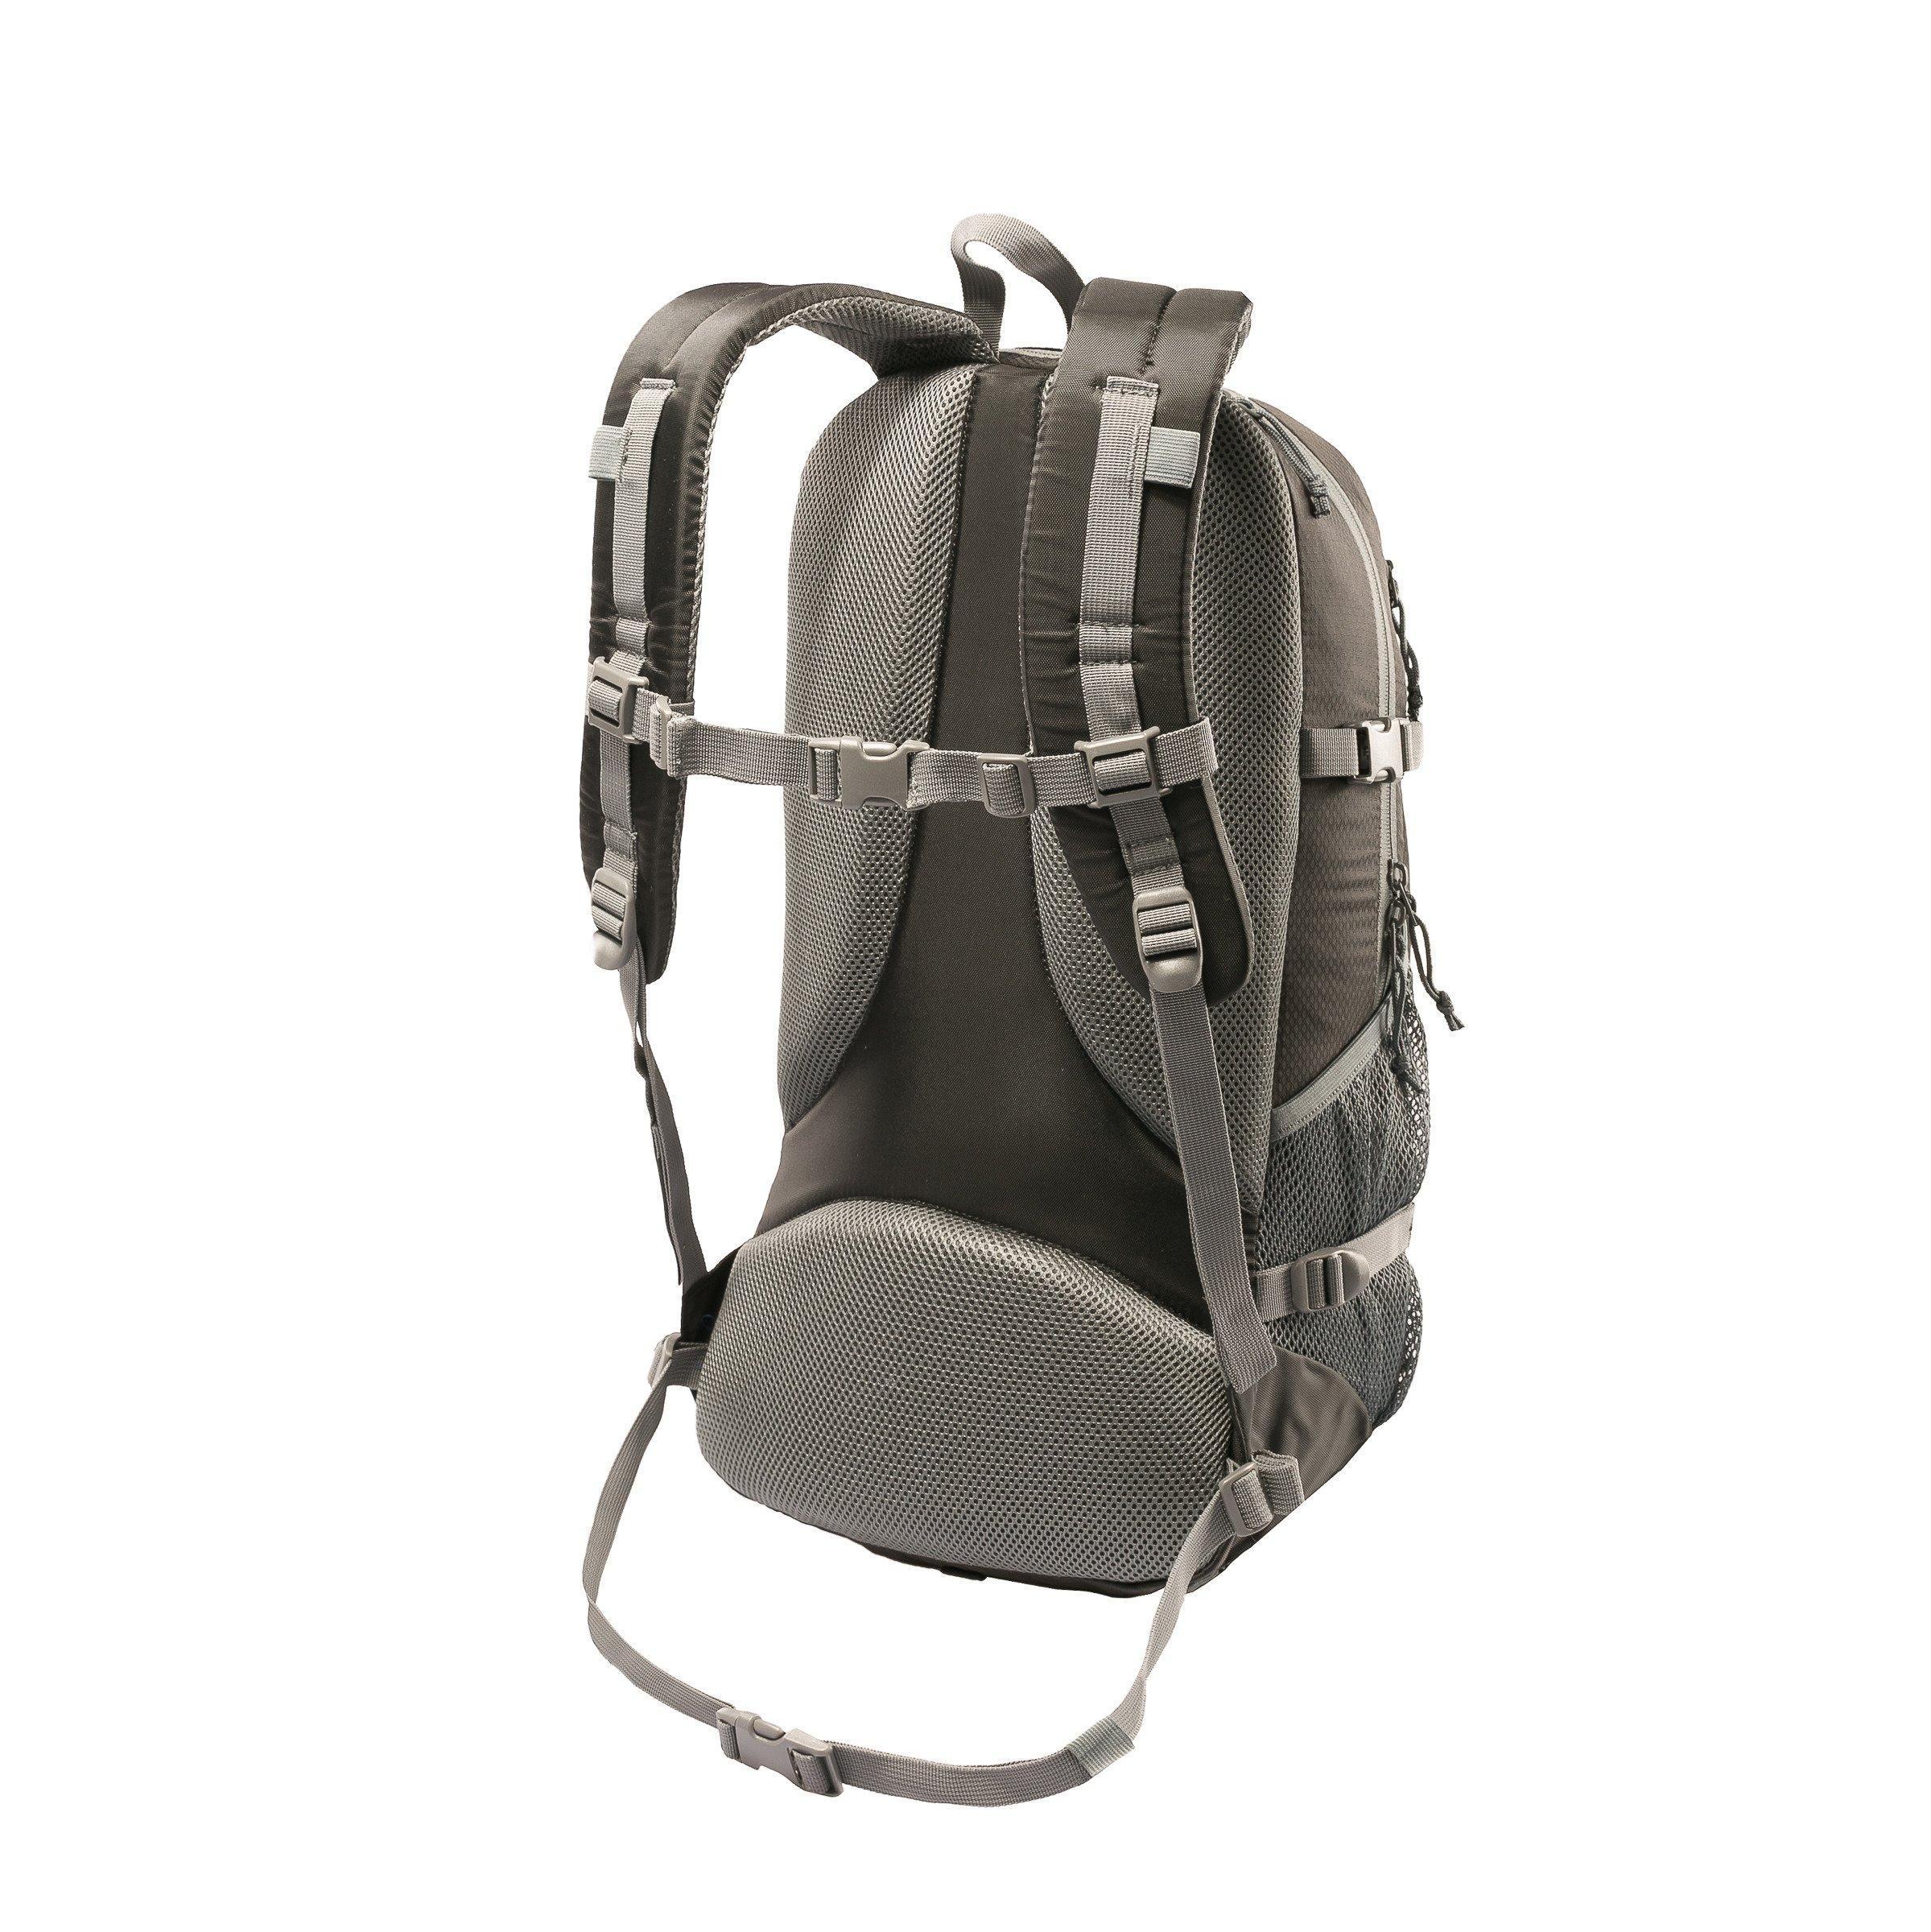 b87c11da6dcb0 Plecak GERANGER 30 spring power/black | plecaki i torby \ małe < 35 ...